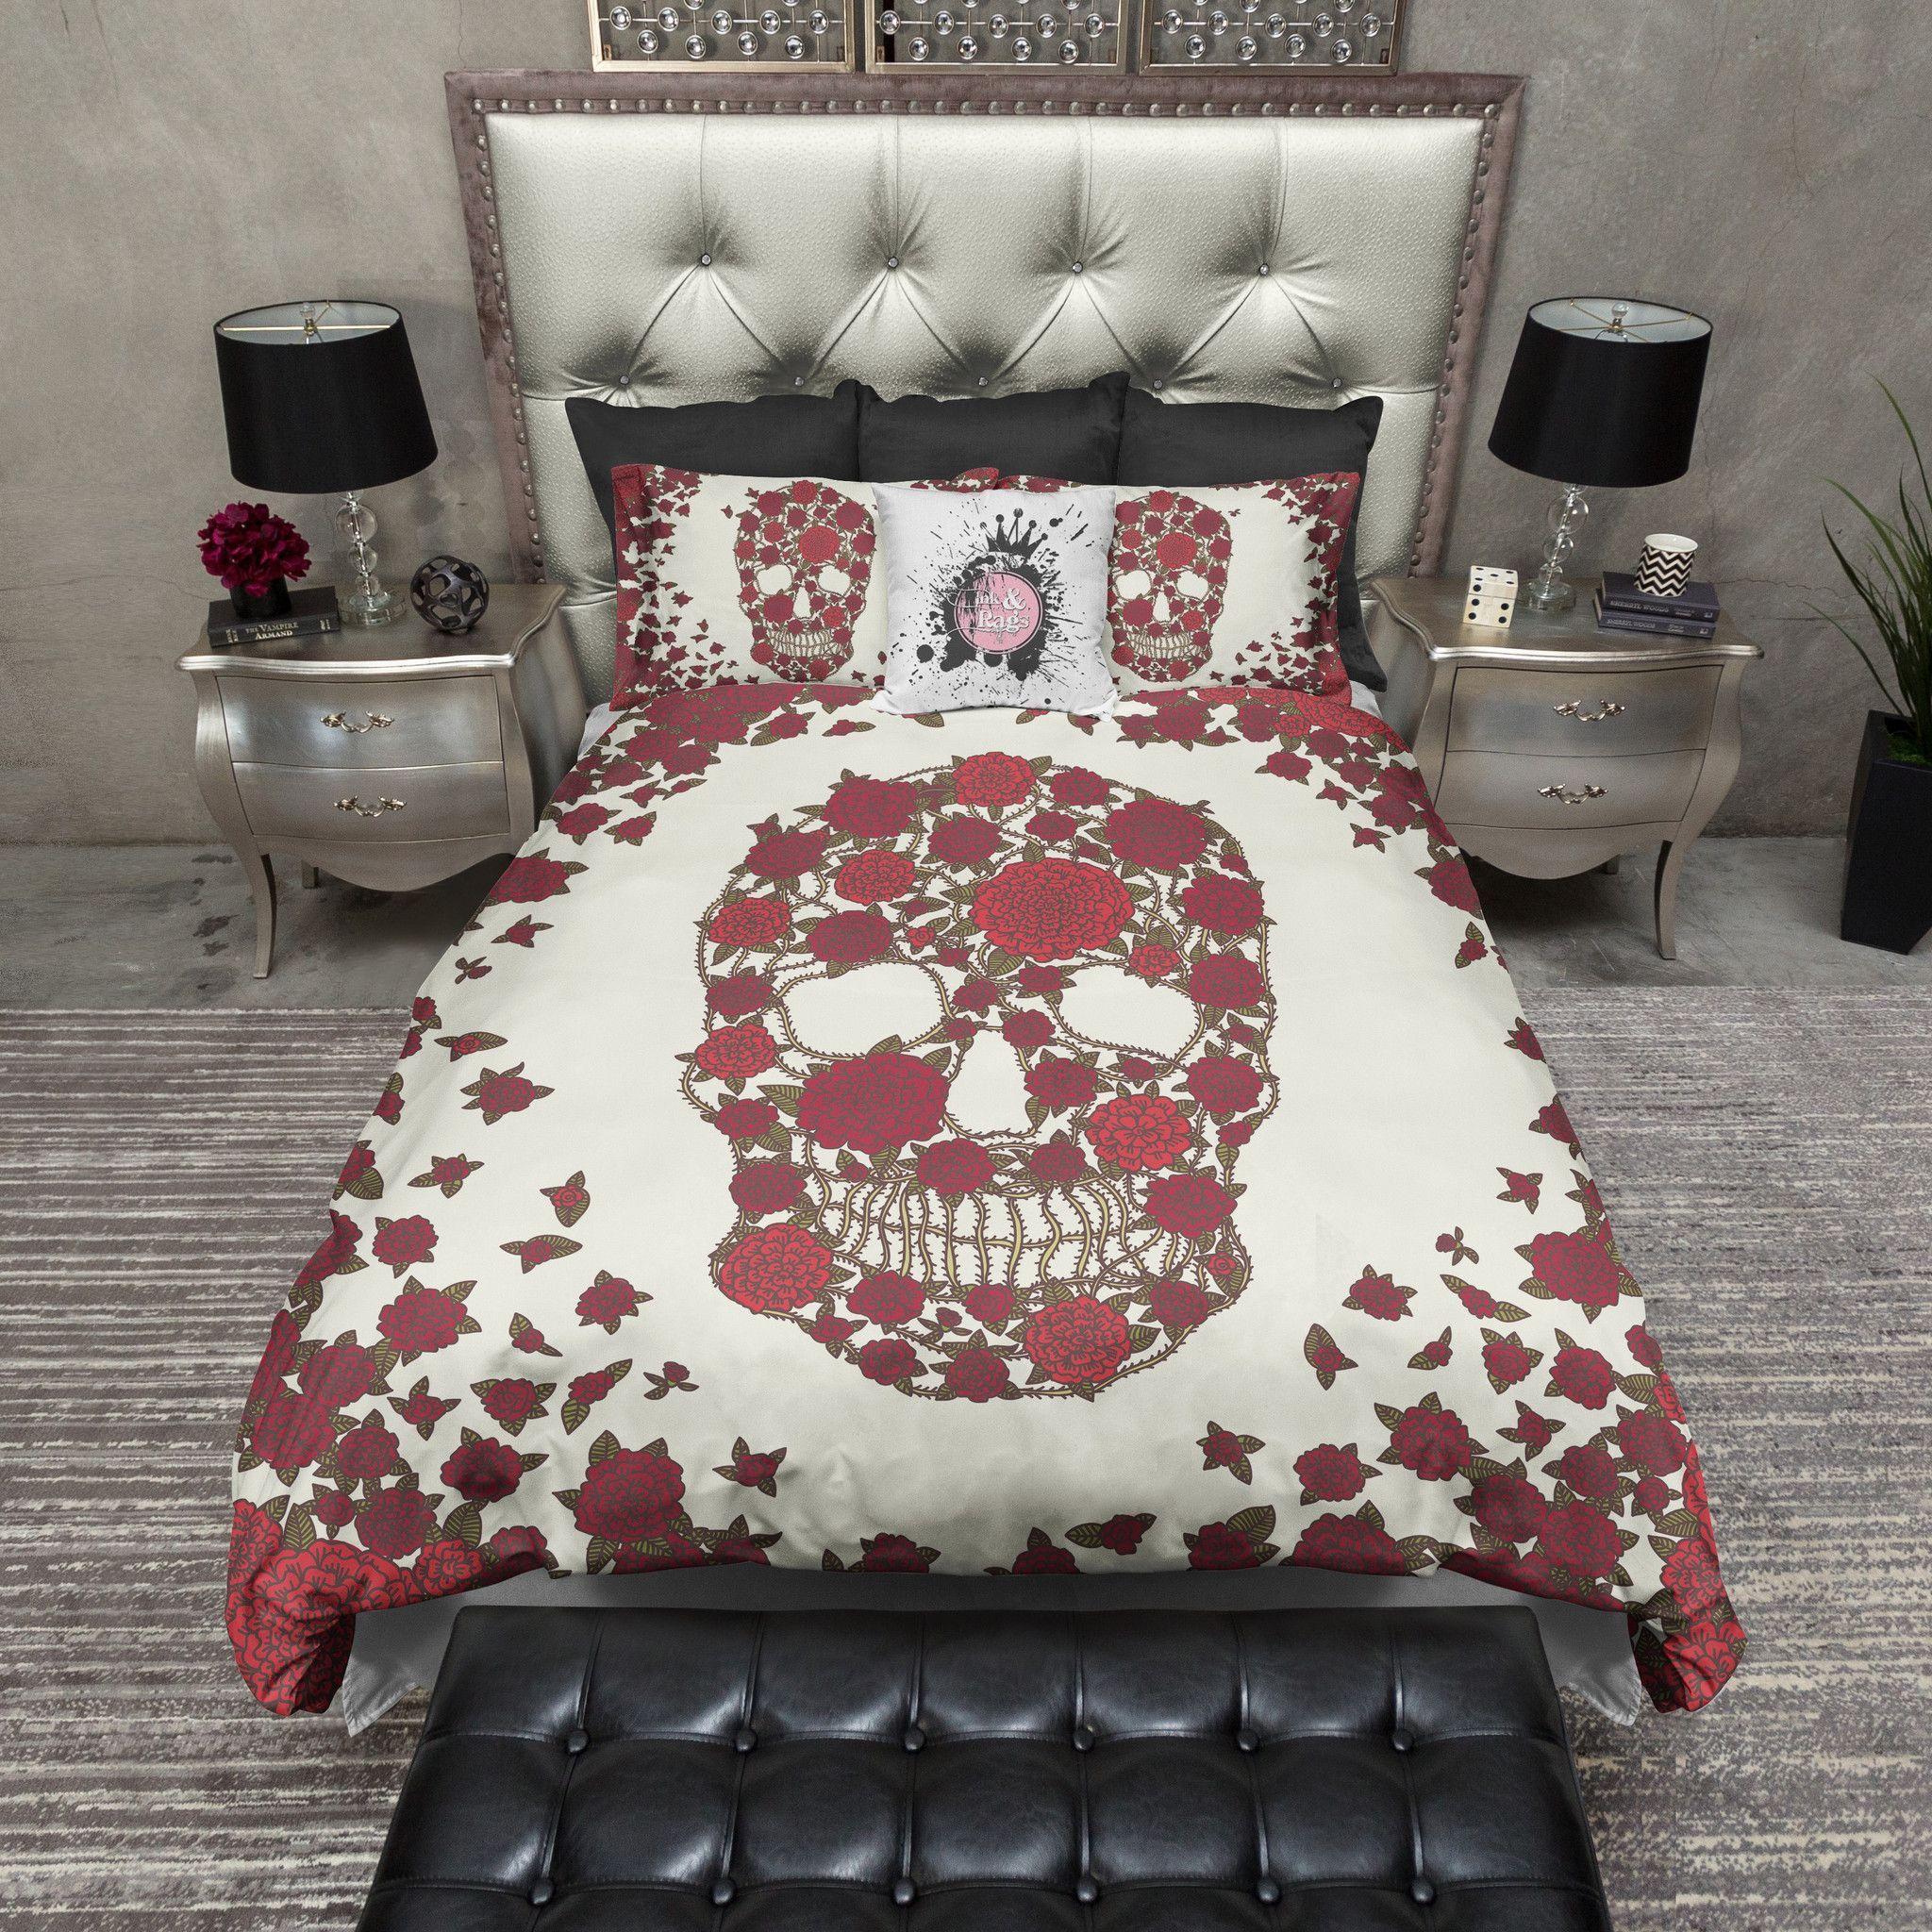 Red Dahlia Skull Bedding Cream Duvet Bedding Sets Bedding Sets Skull Bedding